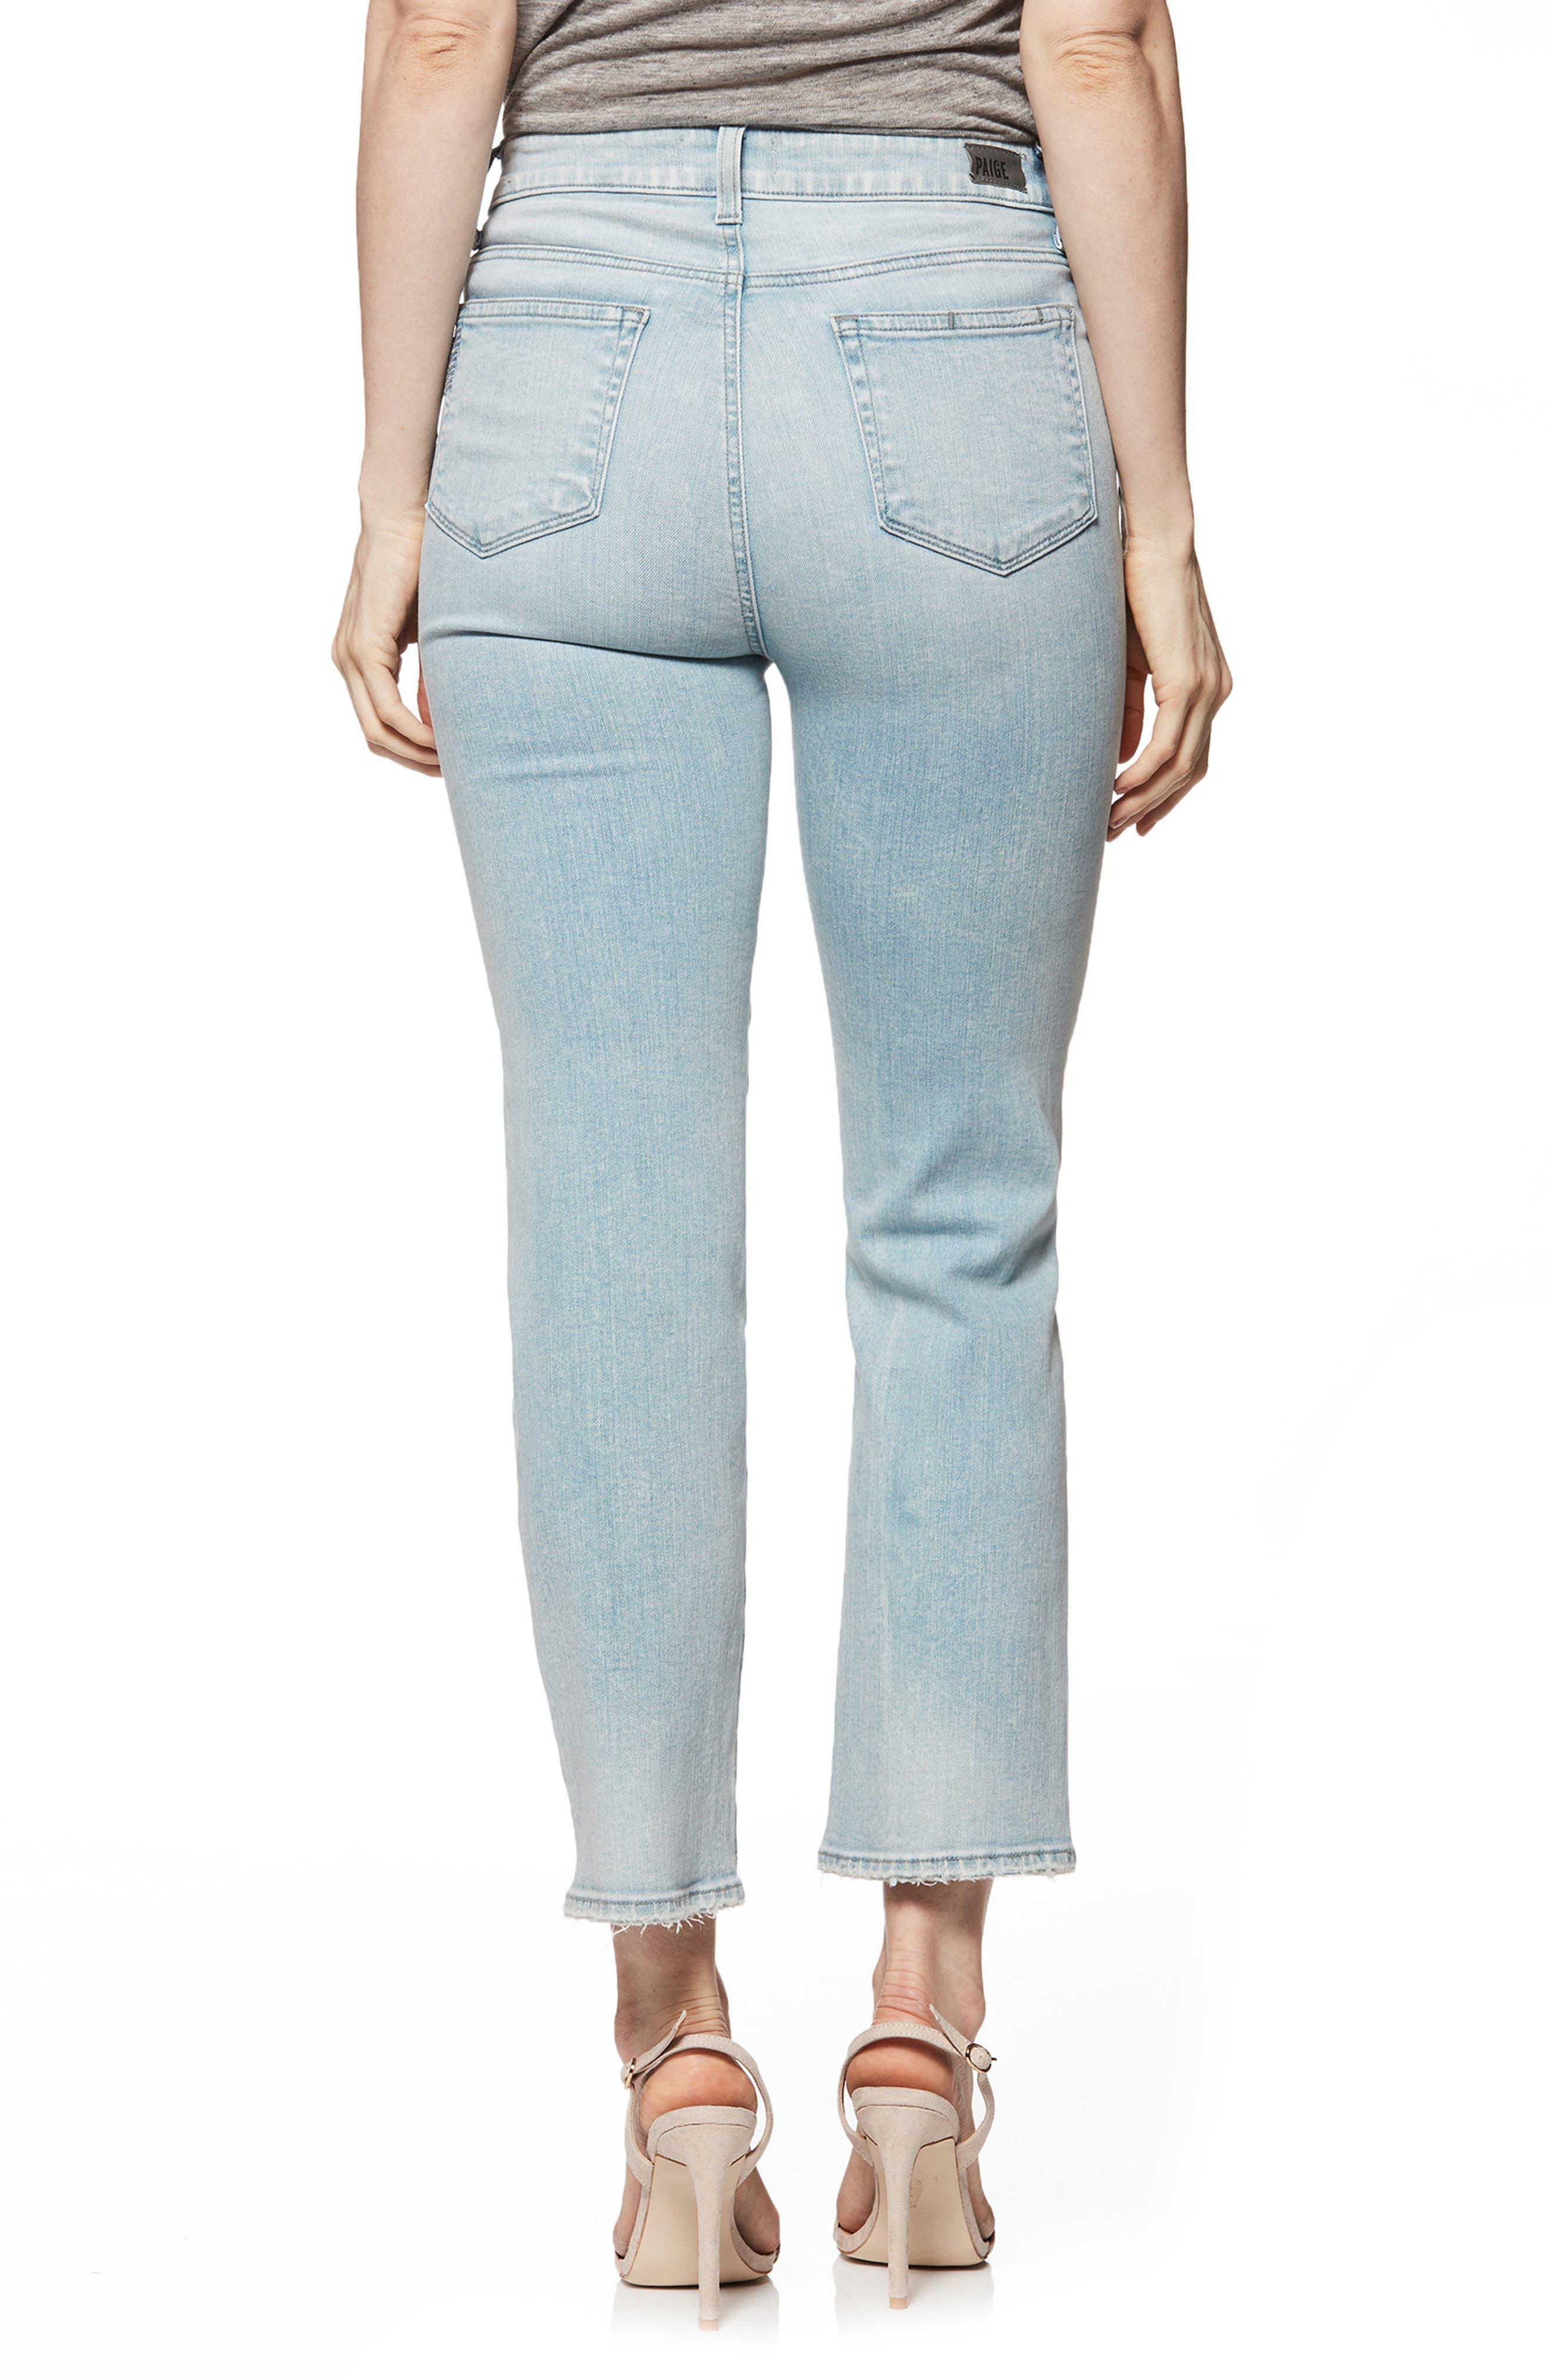 Margot High Waist Straight Leg Jeans,                             Alternate thumbnail 2, color,                             Pasadena W/ Wash Crease